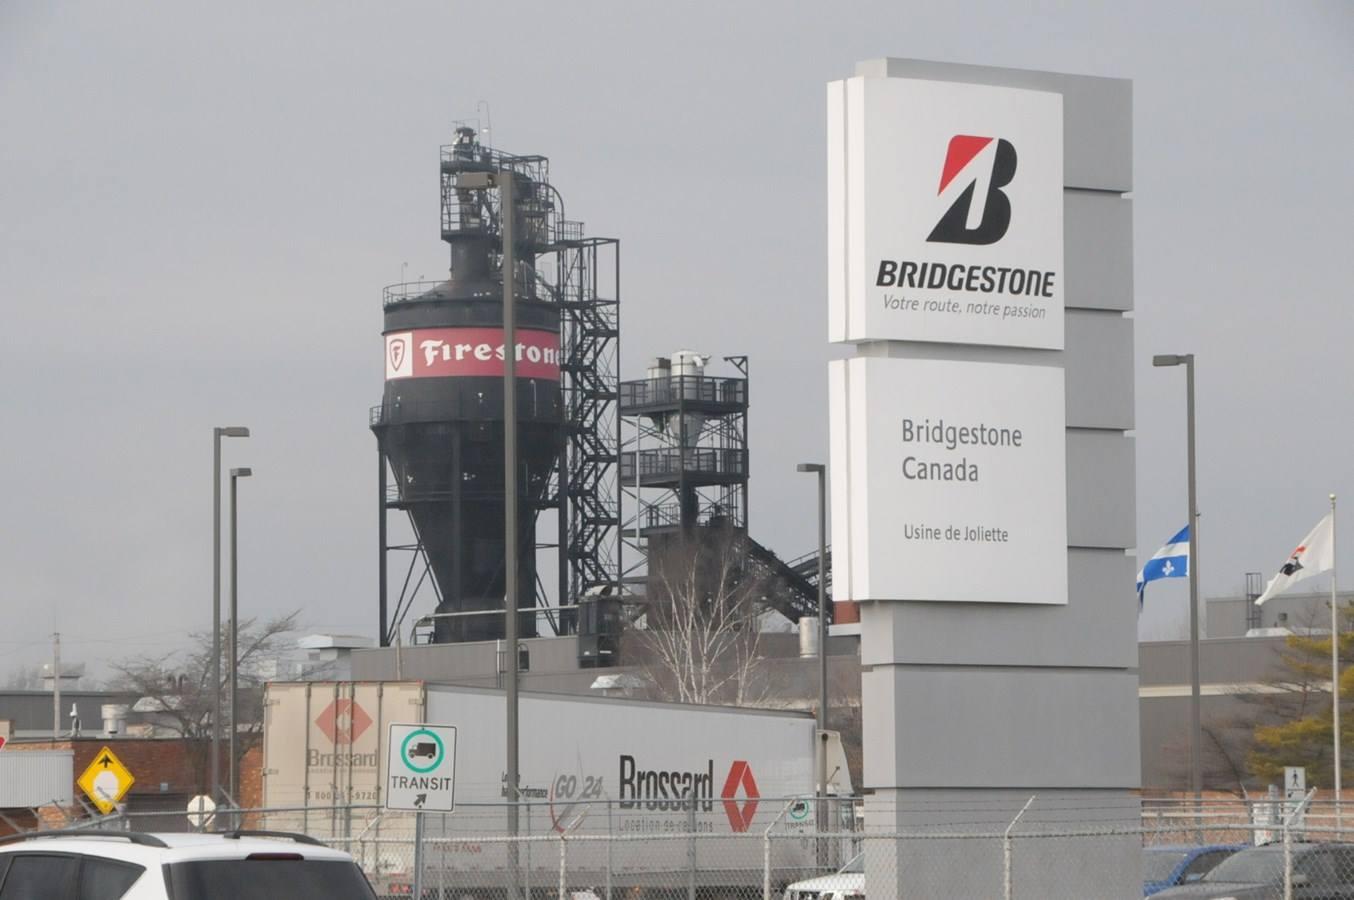 Bridgestone Mill expansion project